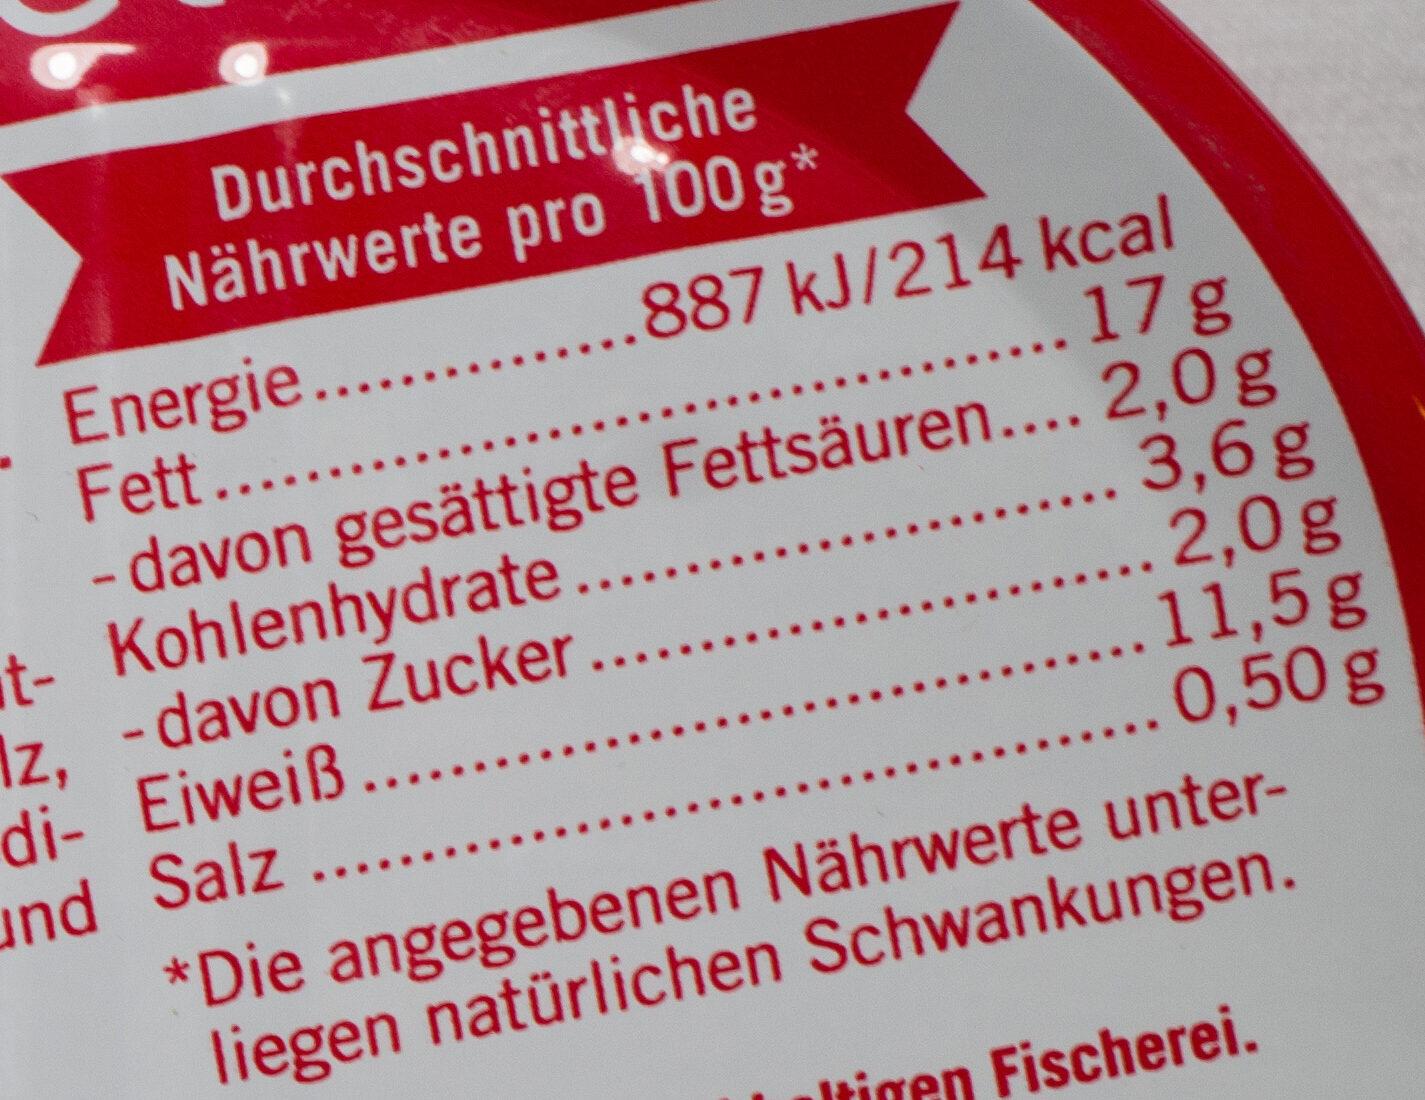 Extra zarte Heringsfilets in Tomaten-Creme - Informations nutritionnelles - de